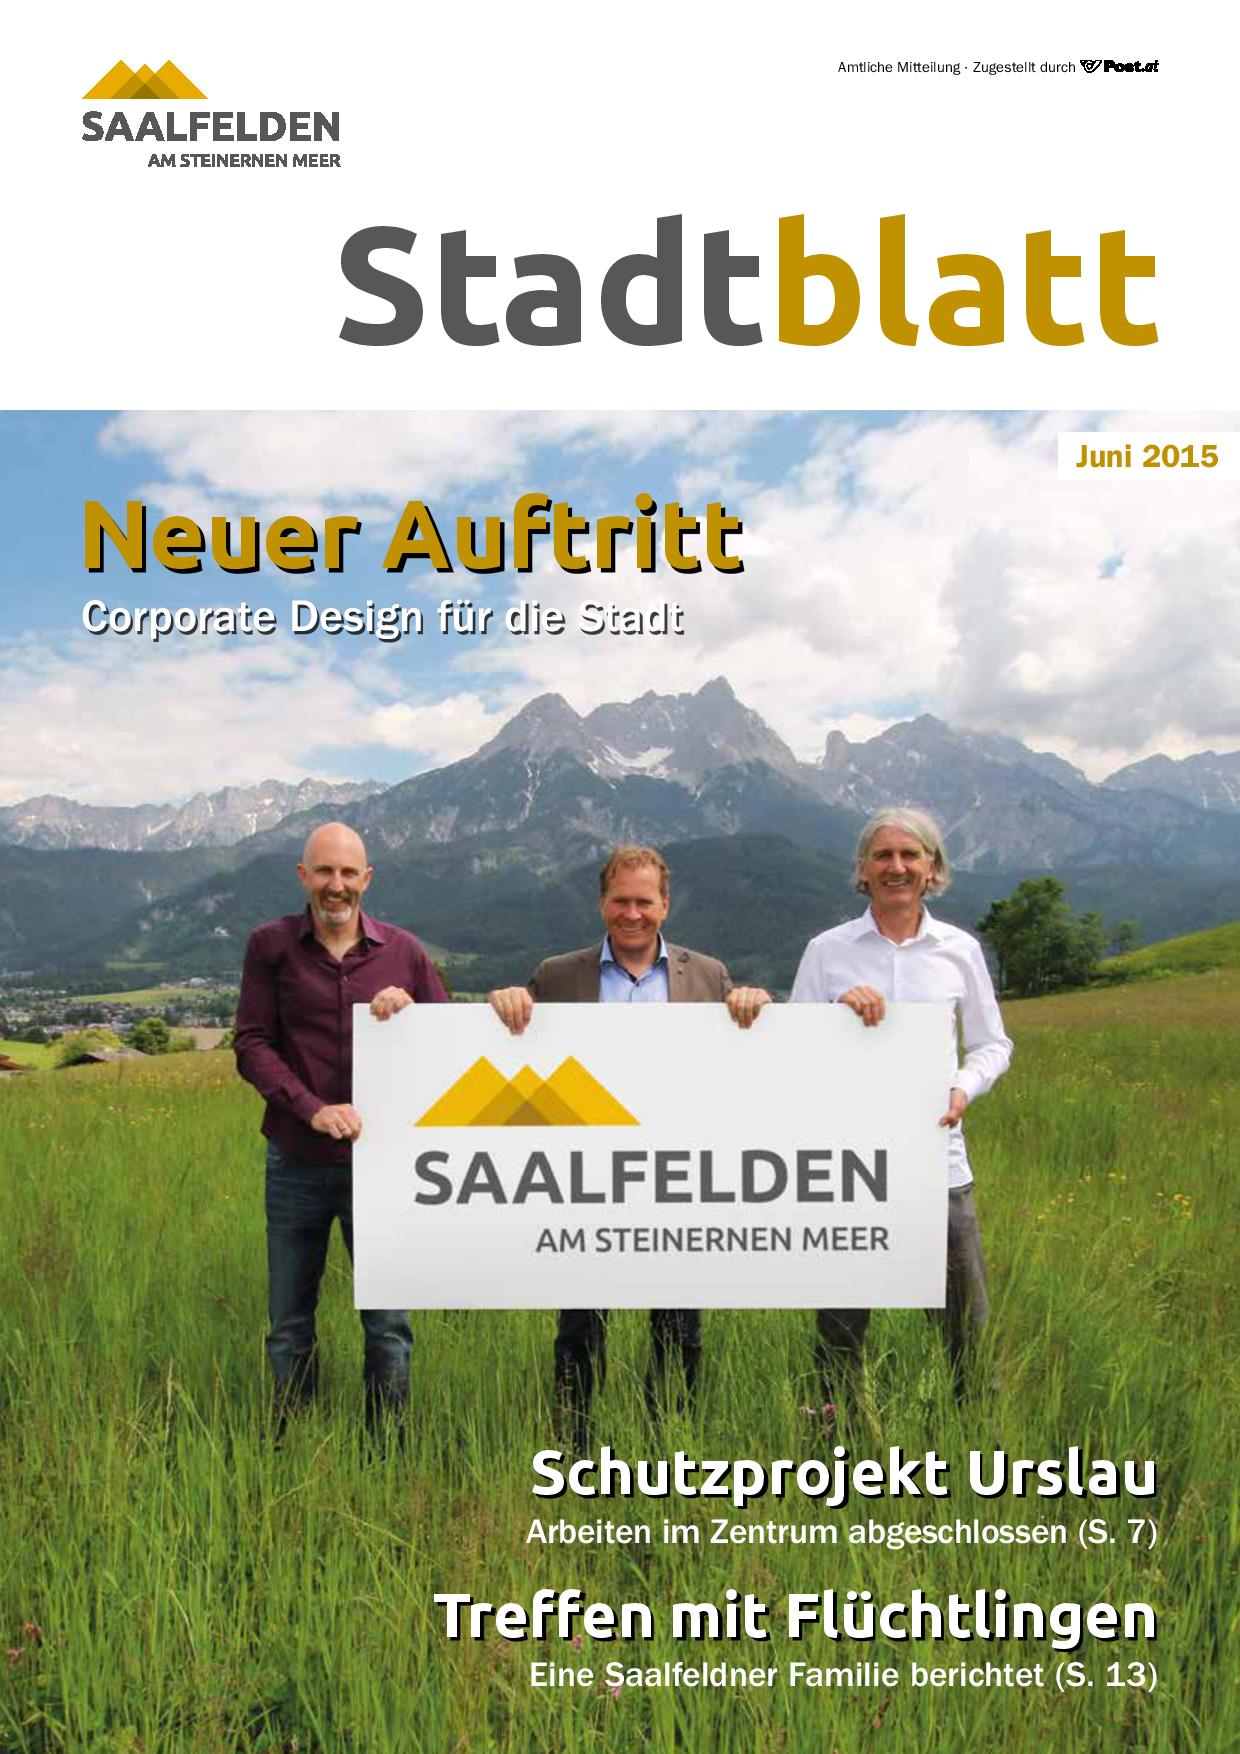 Singles Saalfelden Am Steinernen Meer, Kontaktanzeigen